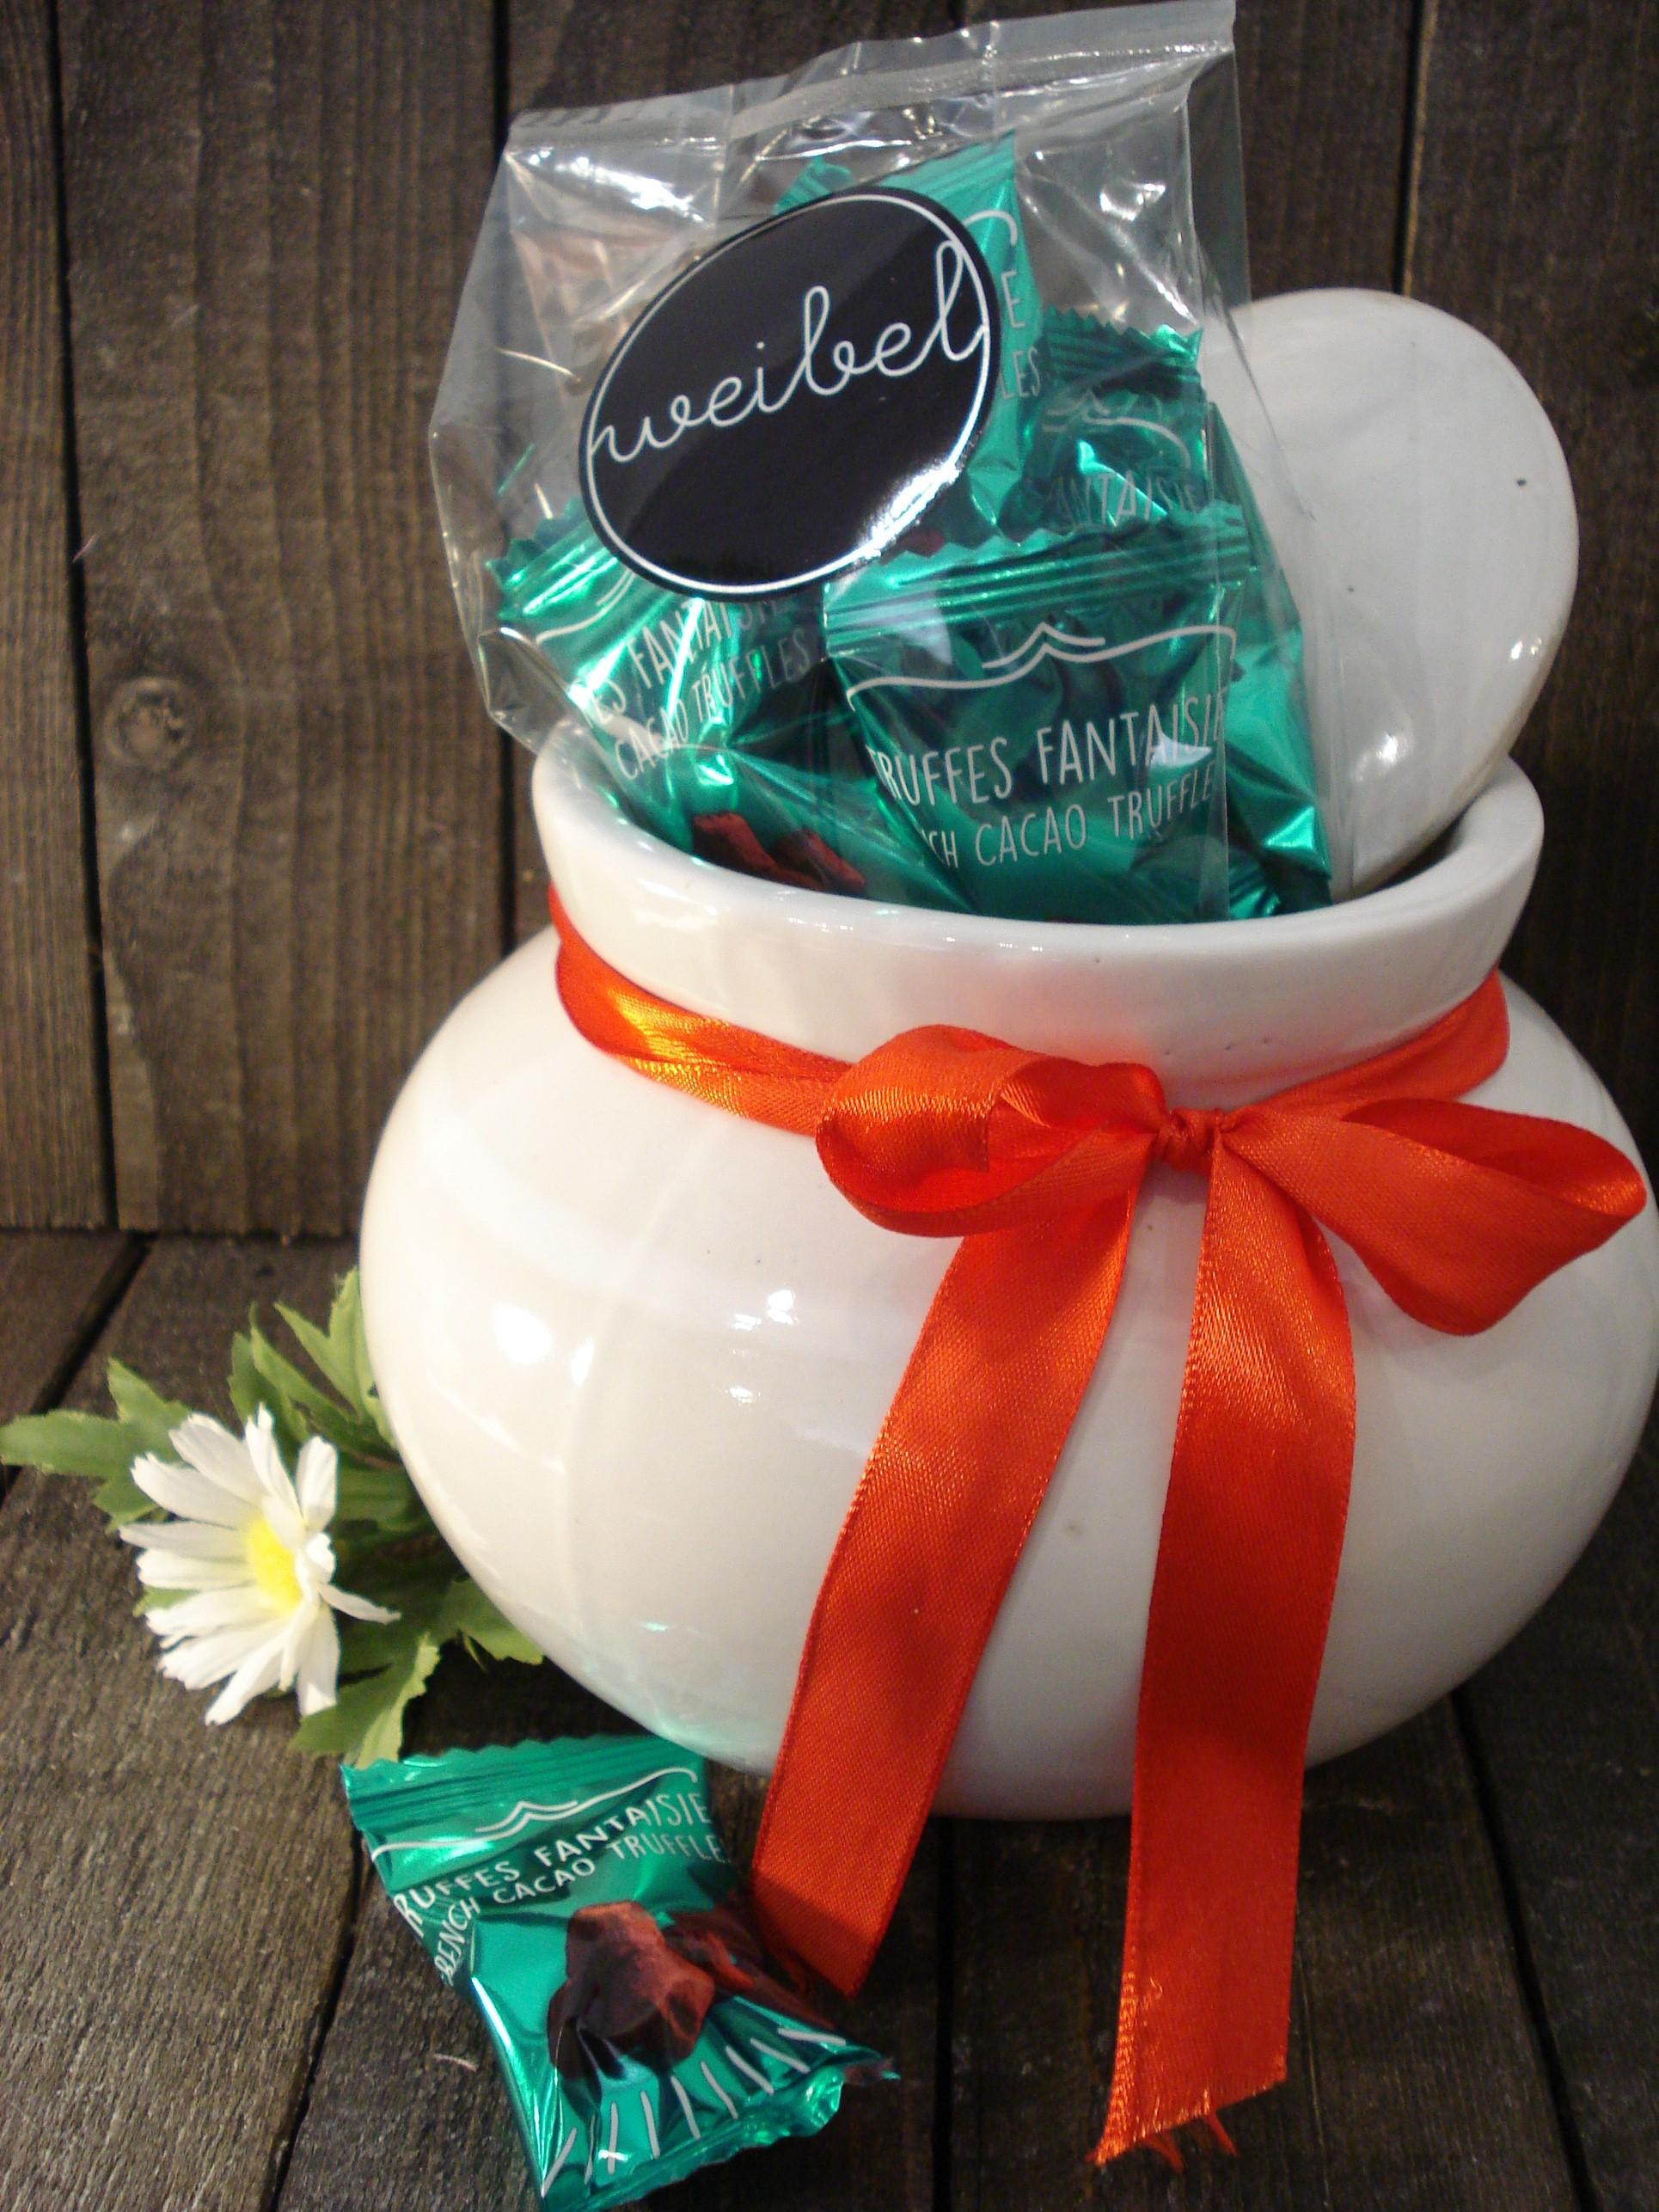 krukke med låg og chokolade gave